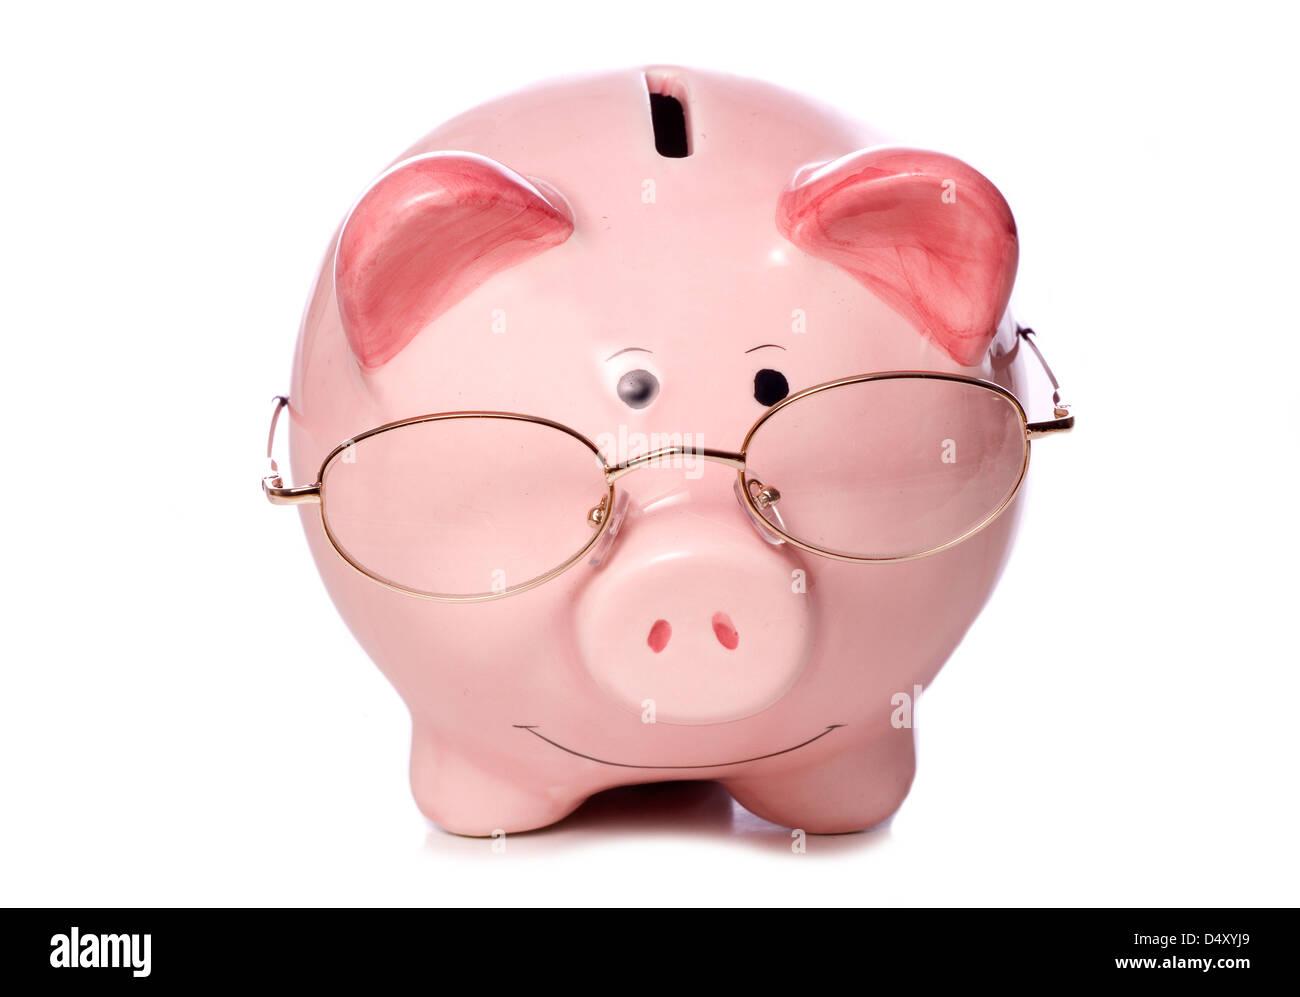 wise money saving piggy bank studio cut out - Stock Image